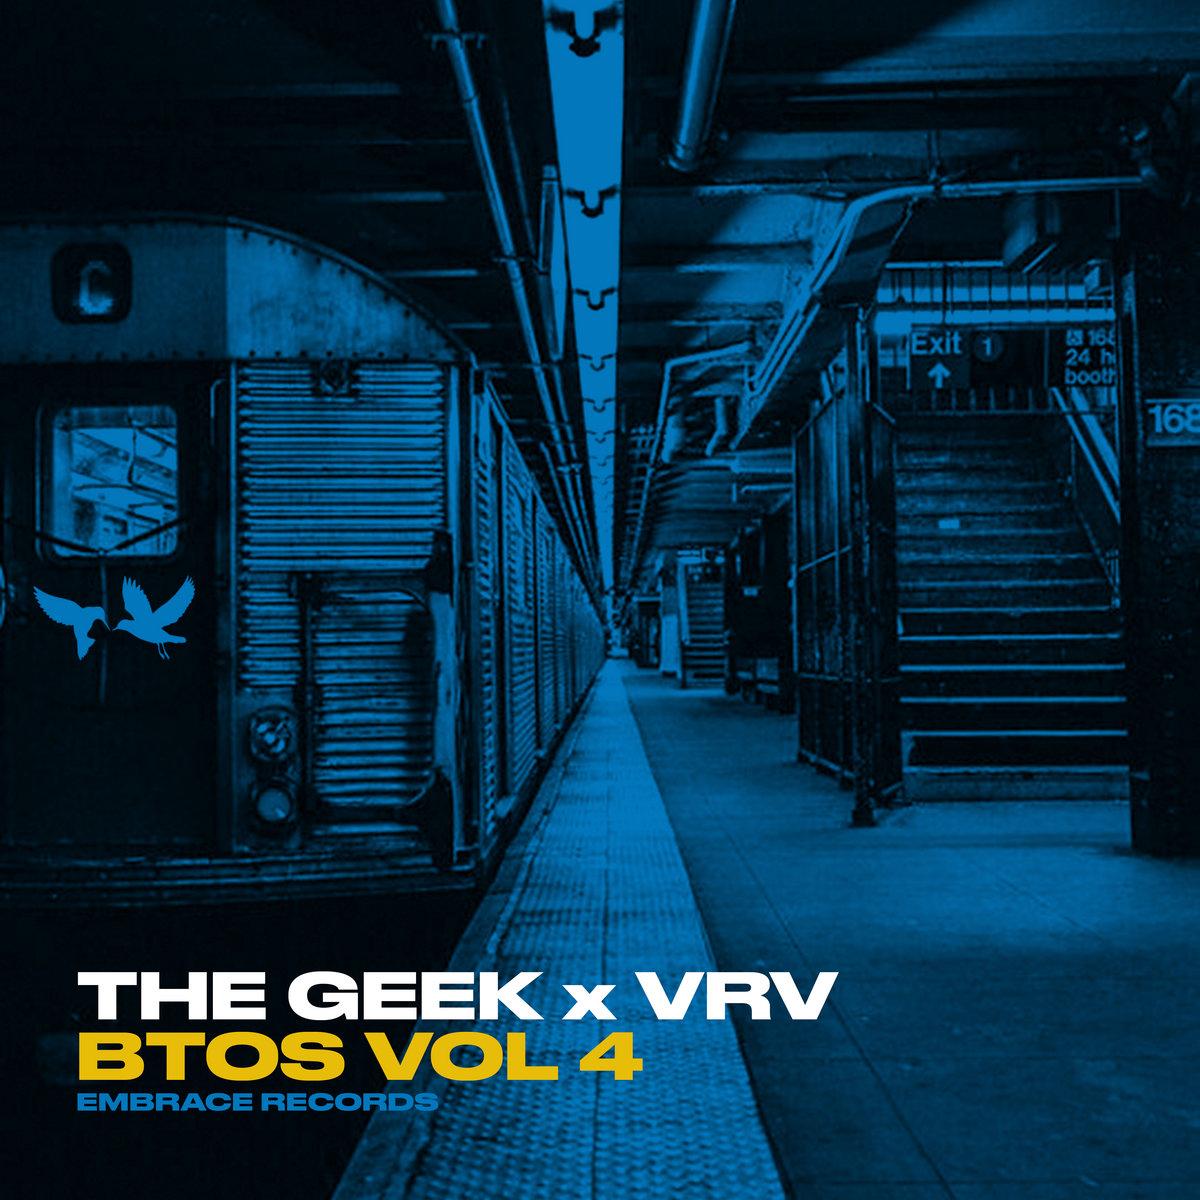 BTOS VOL  4 | The Geek x Vrv